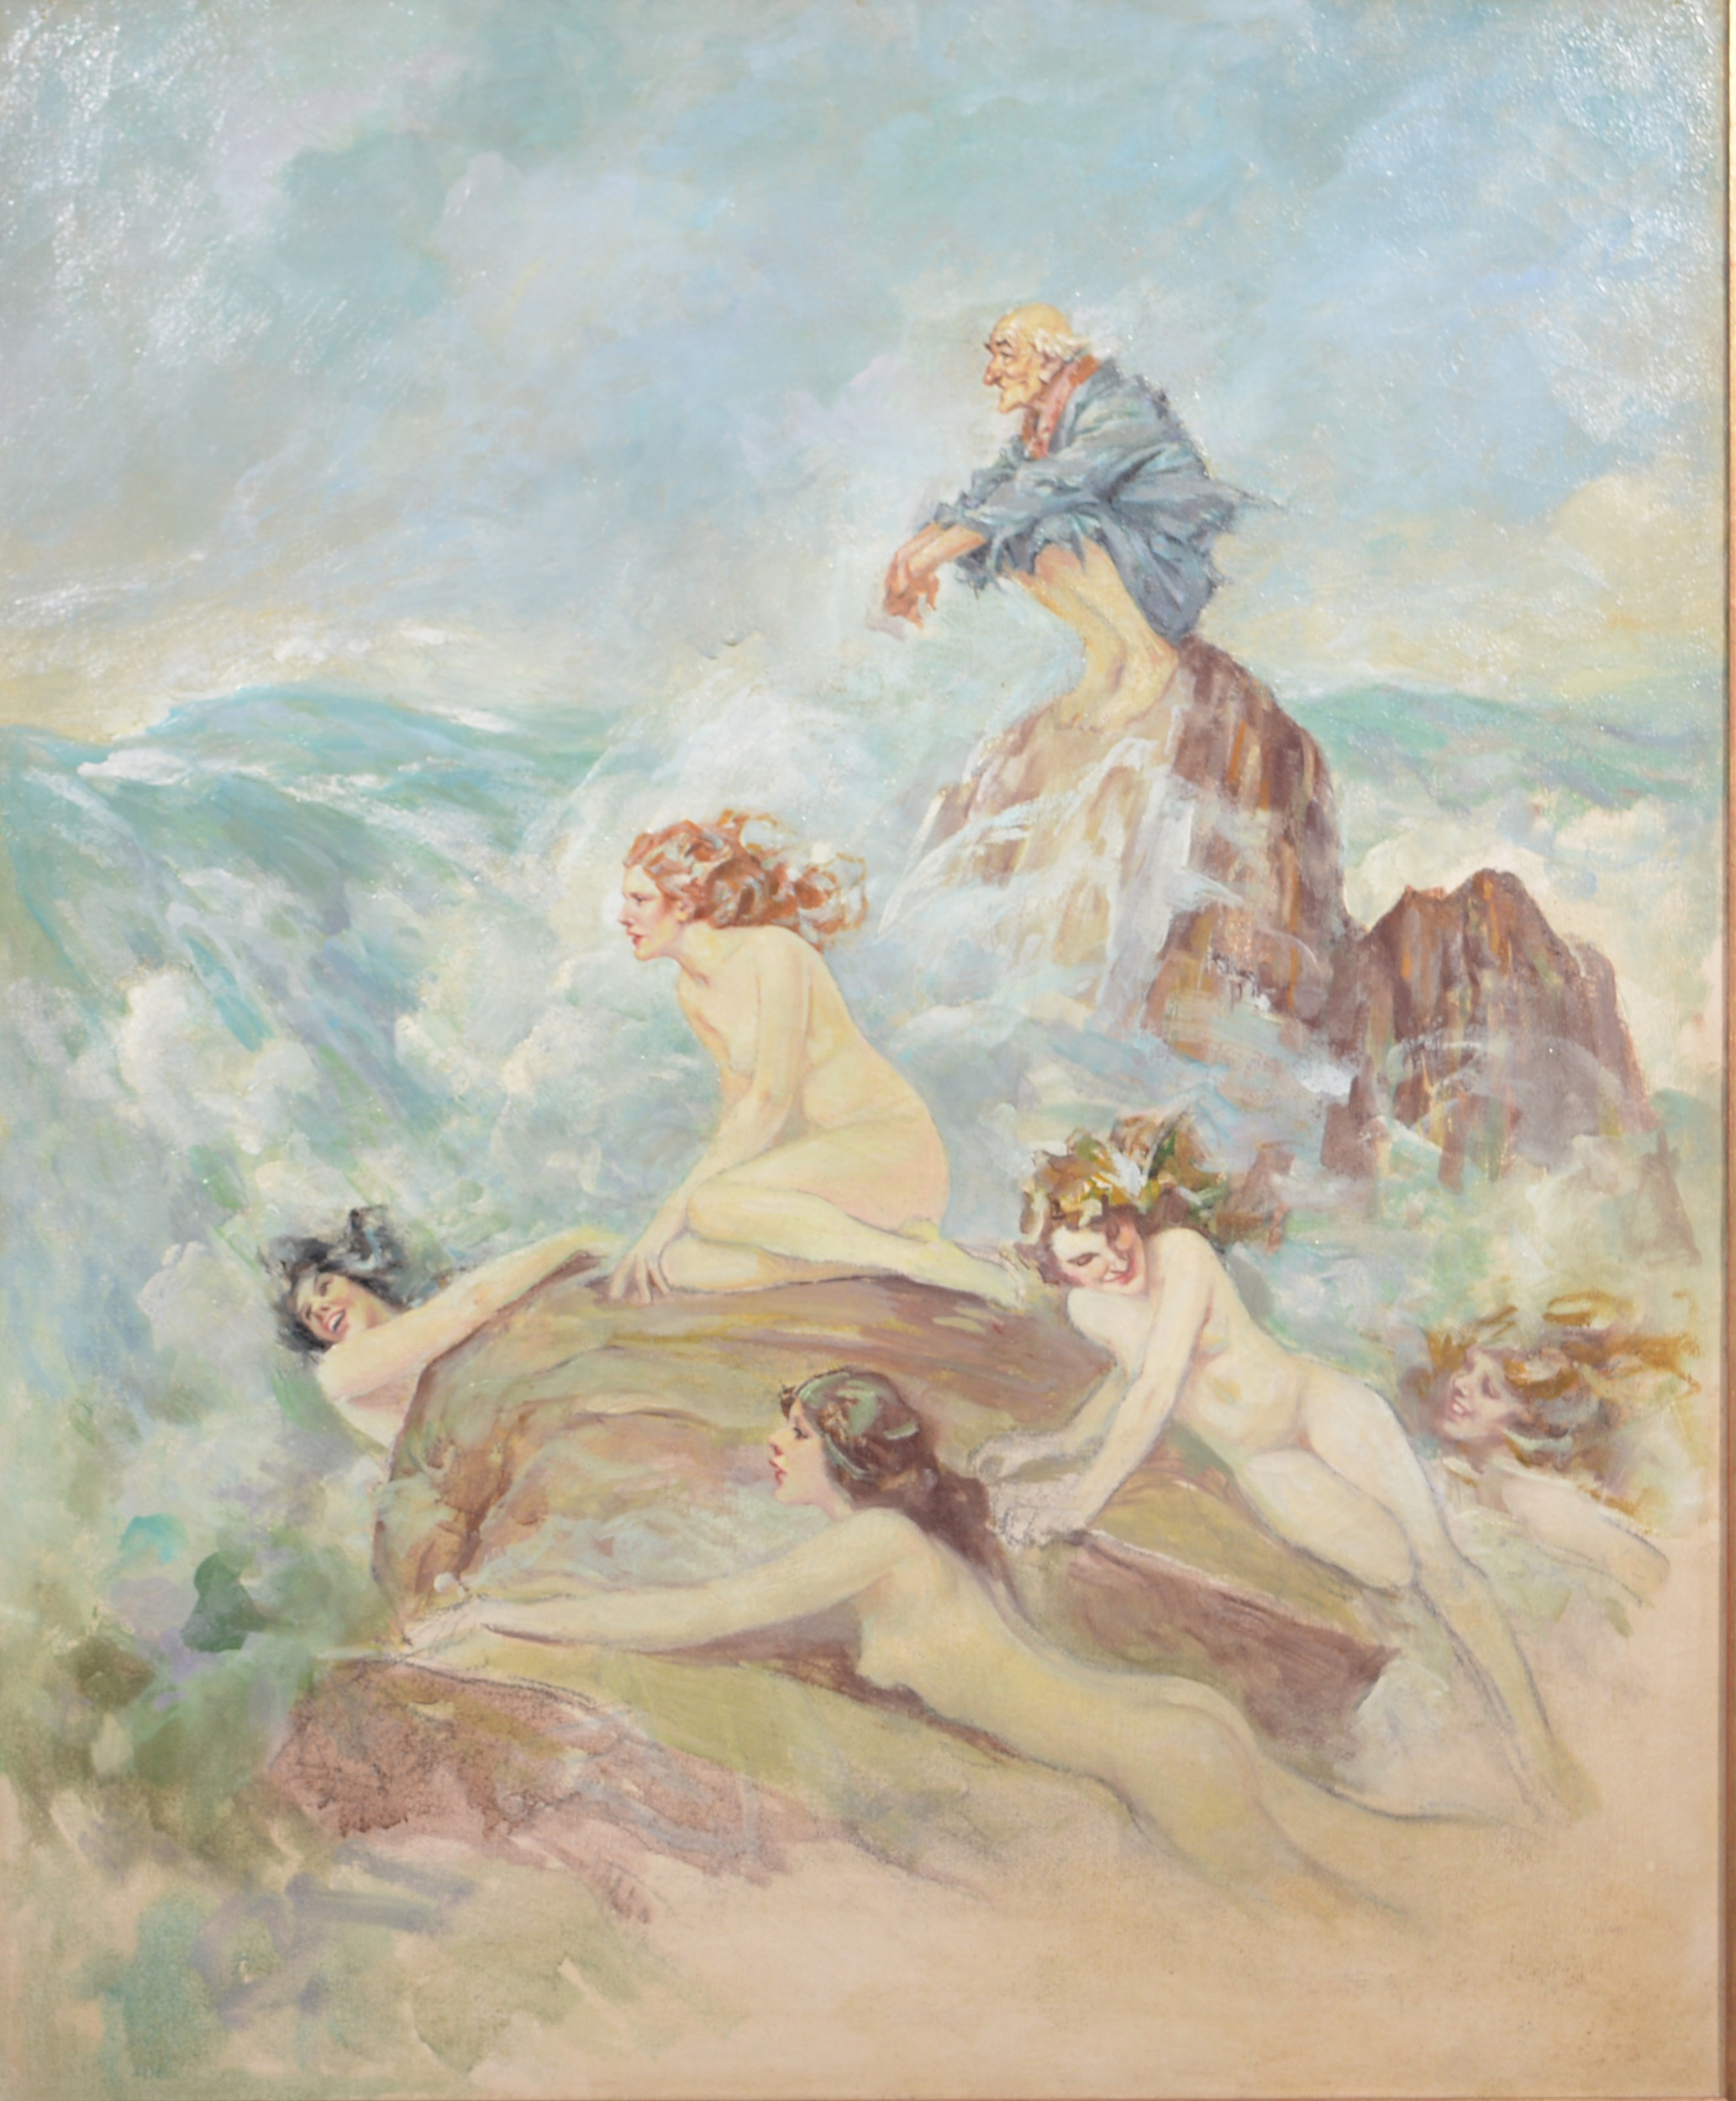 Follower of Norman Alfred William Lindsay, (Australian), Sirens